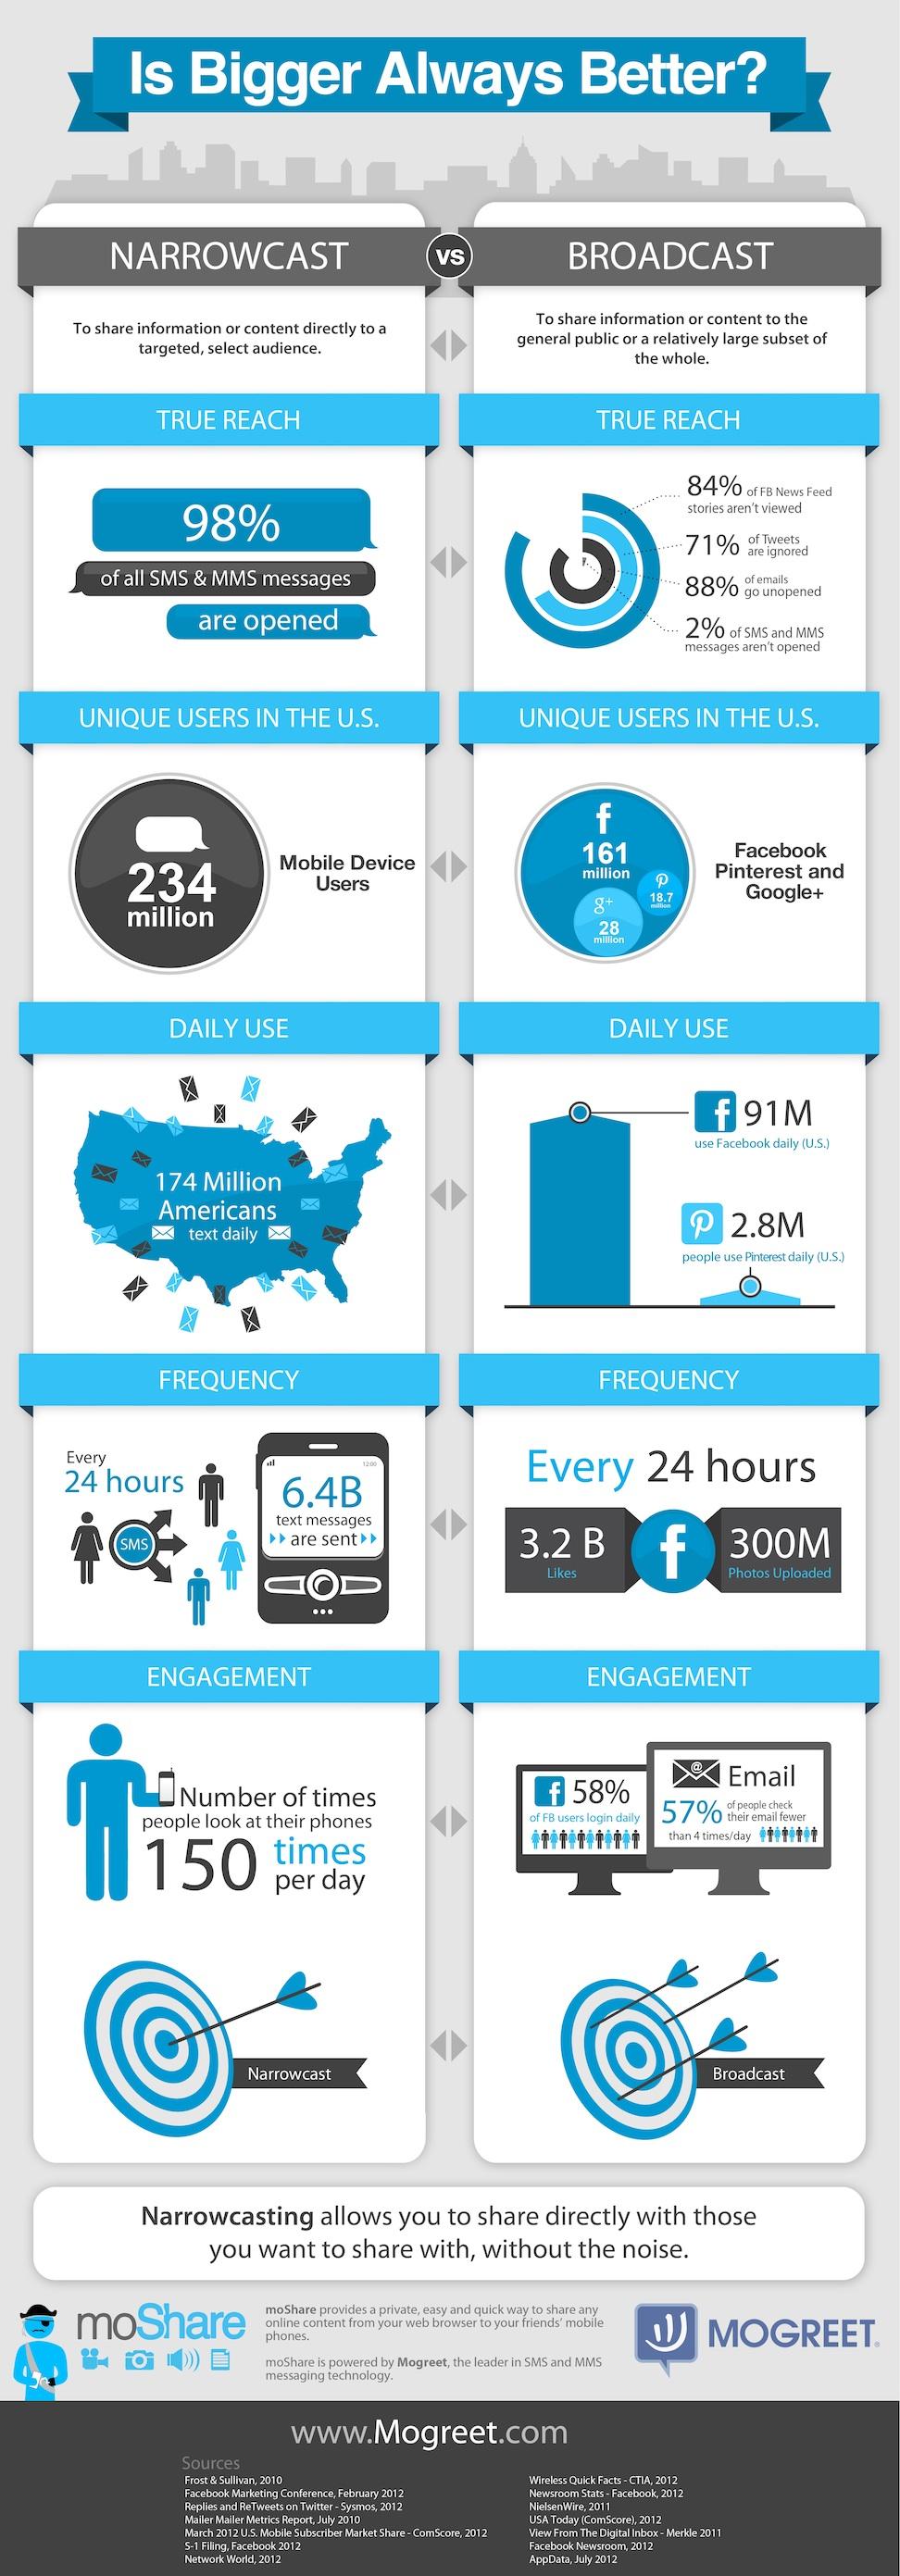 Narrowcast-Vs-Broadcast-infographic